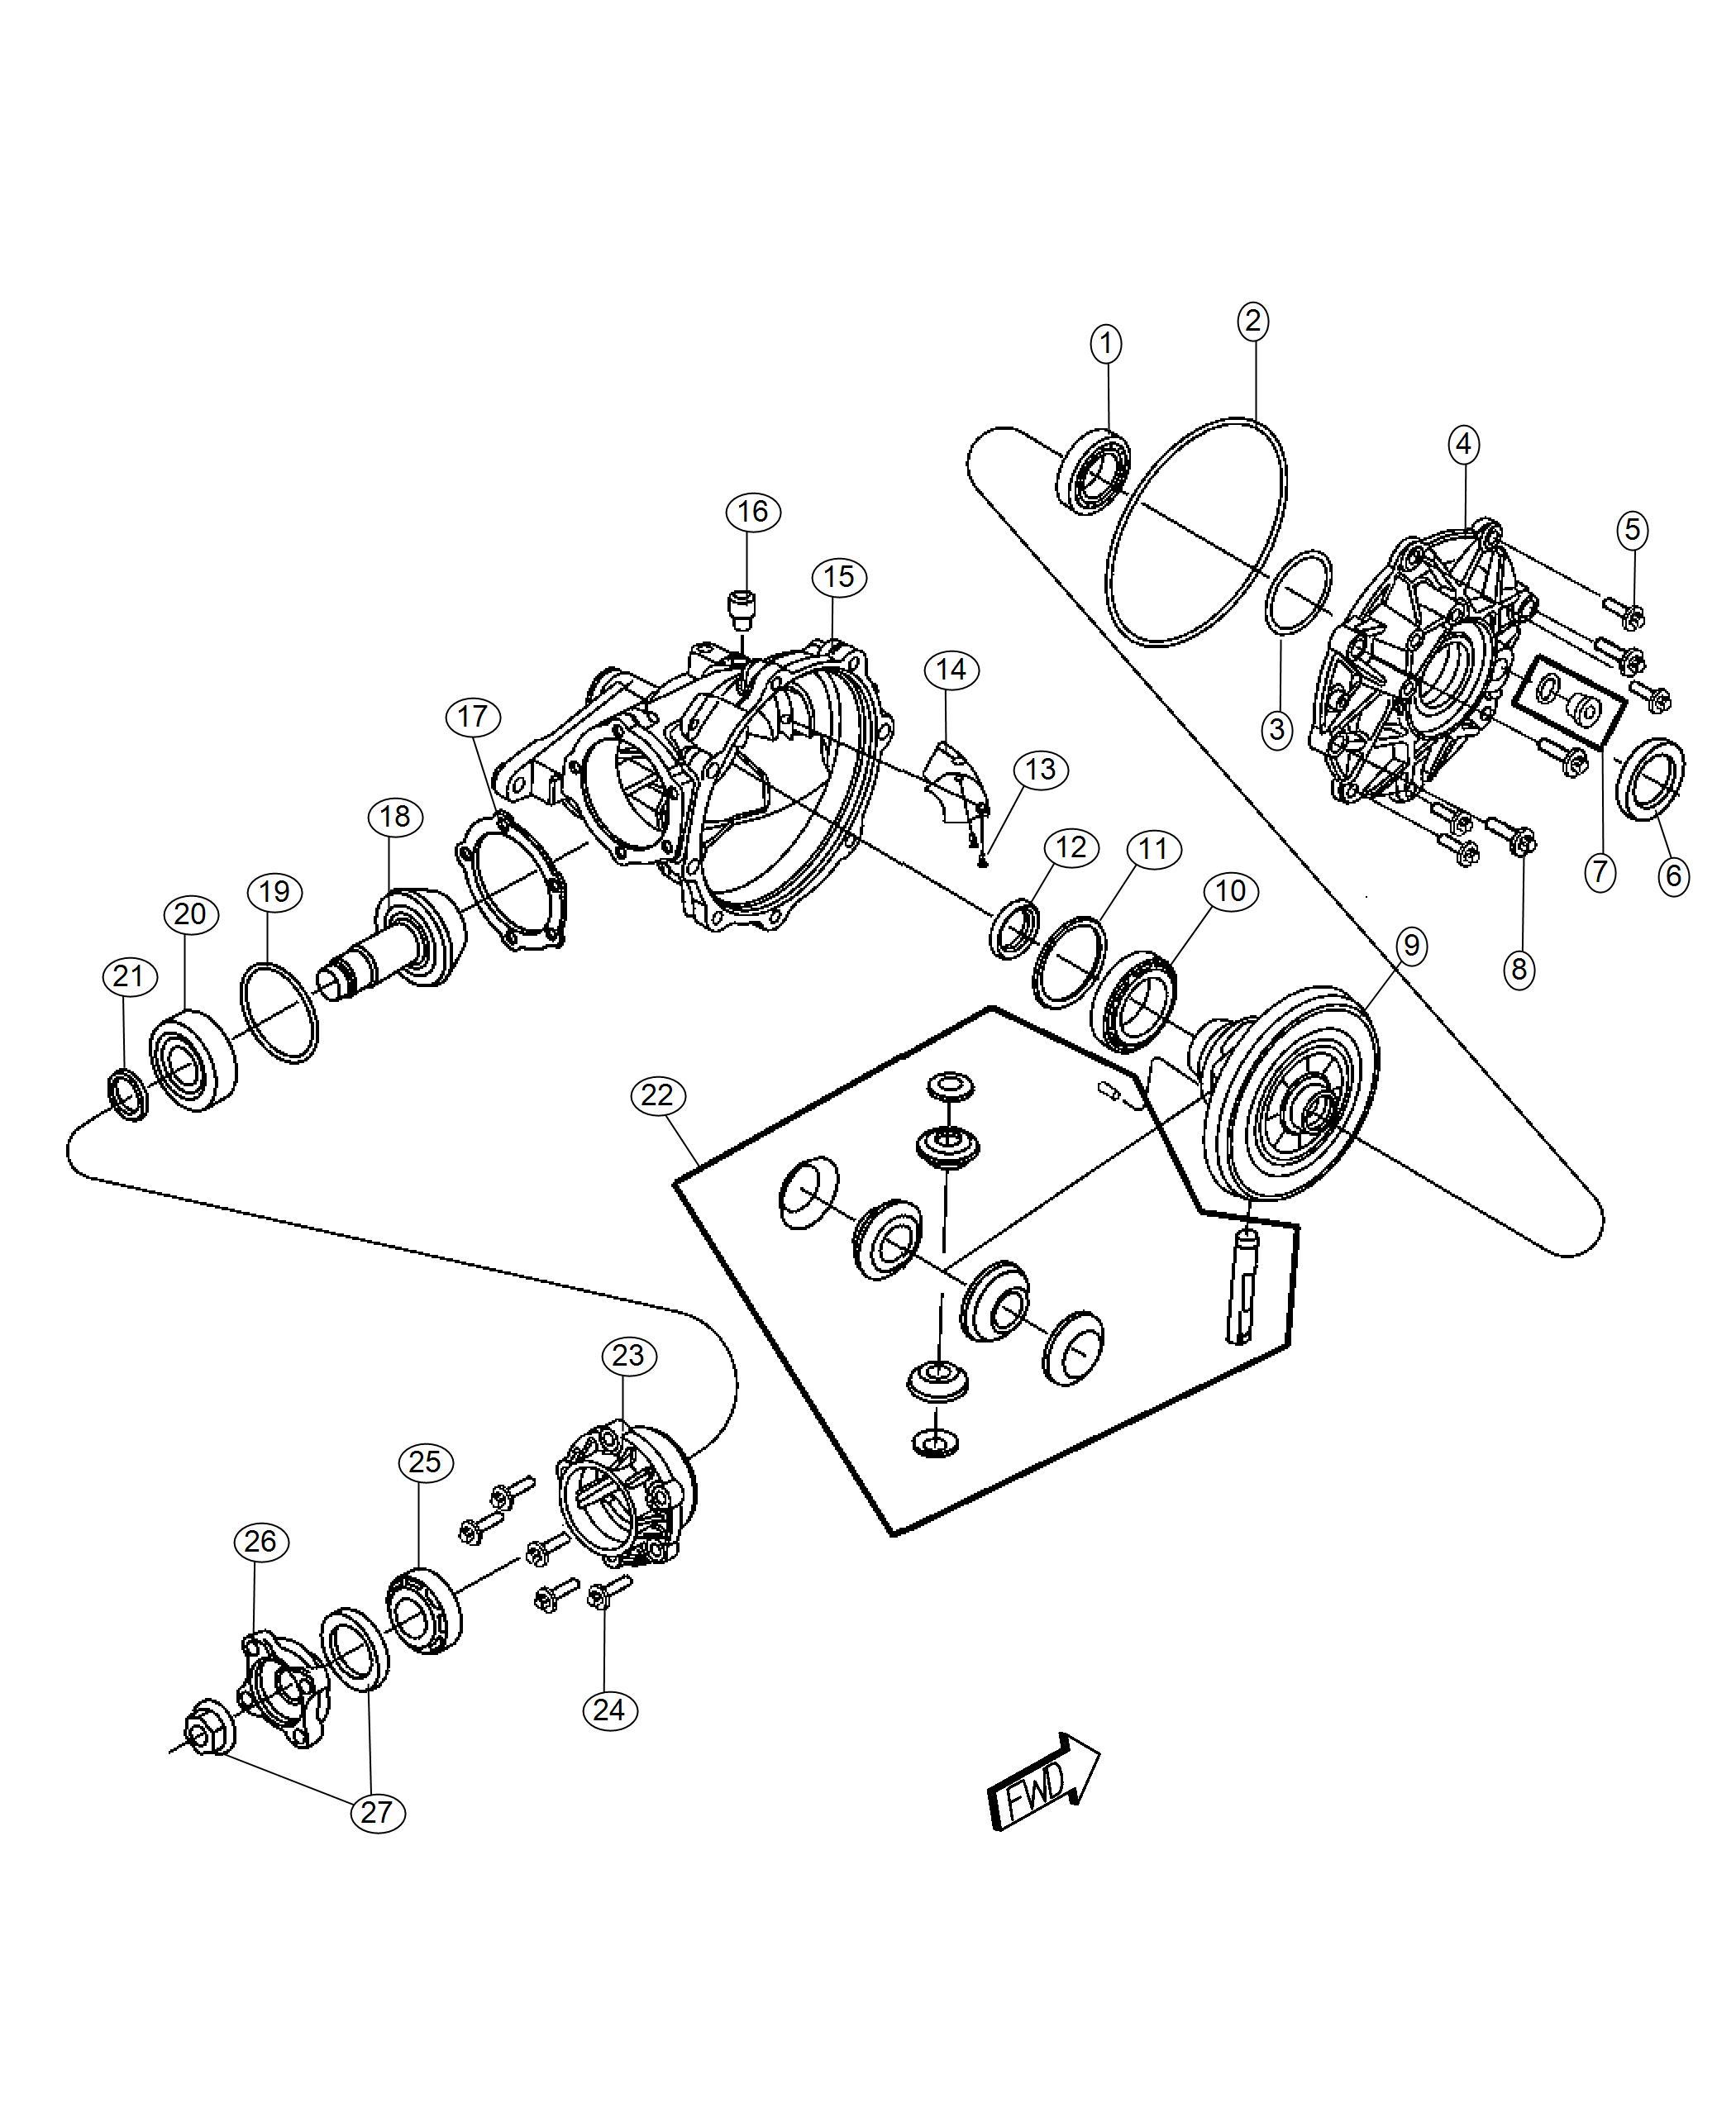 Dodge Challenger Shim. Drive pinion bearing. 1.87 mm, 1